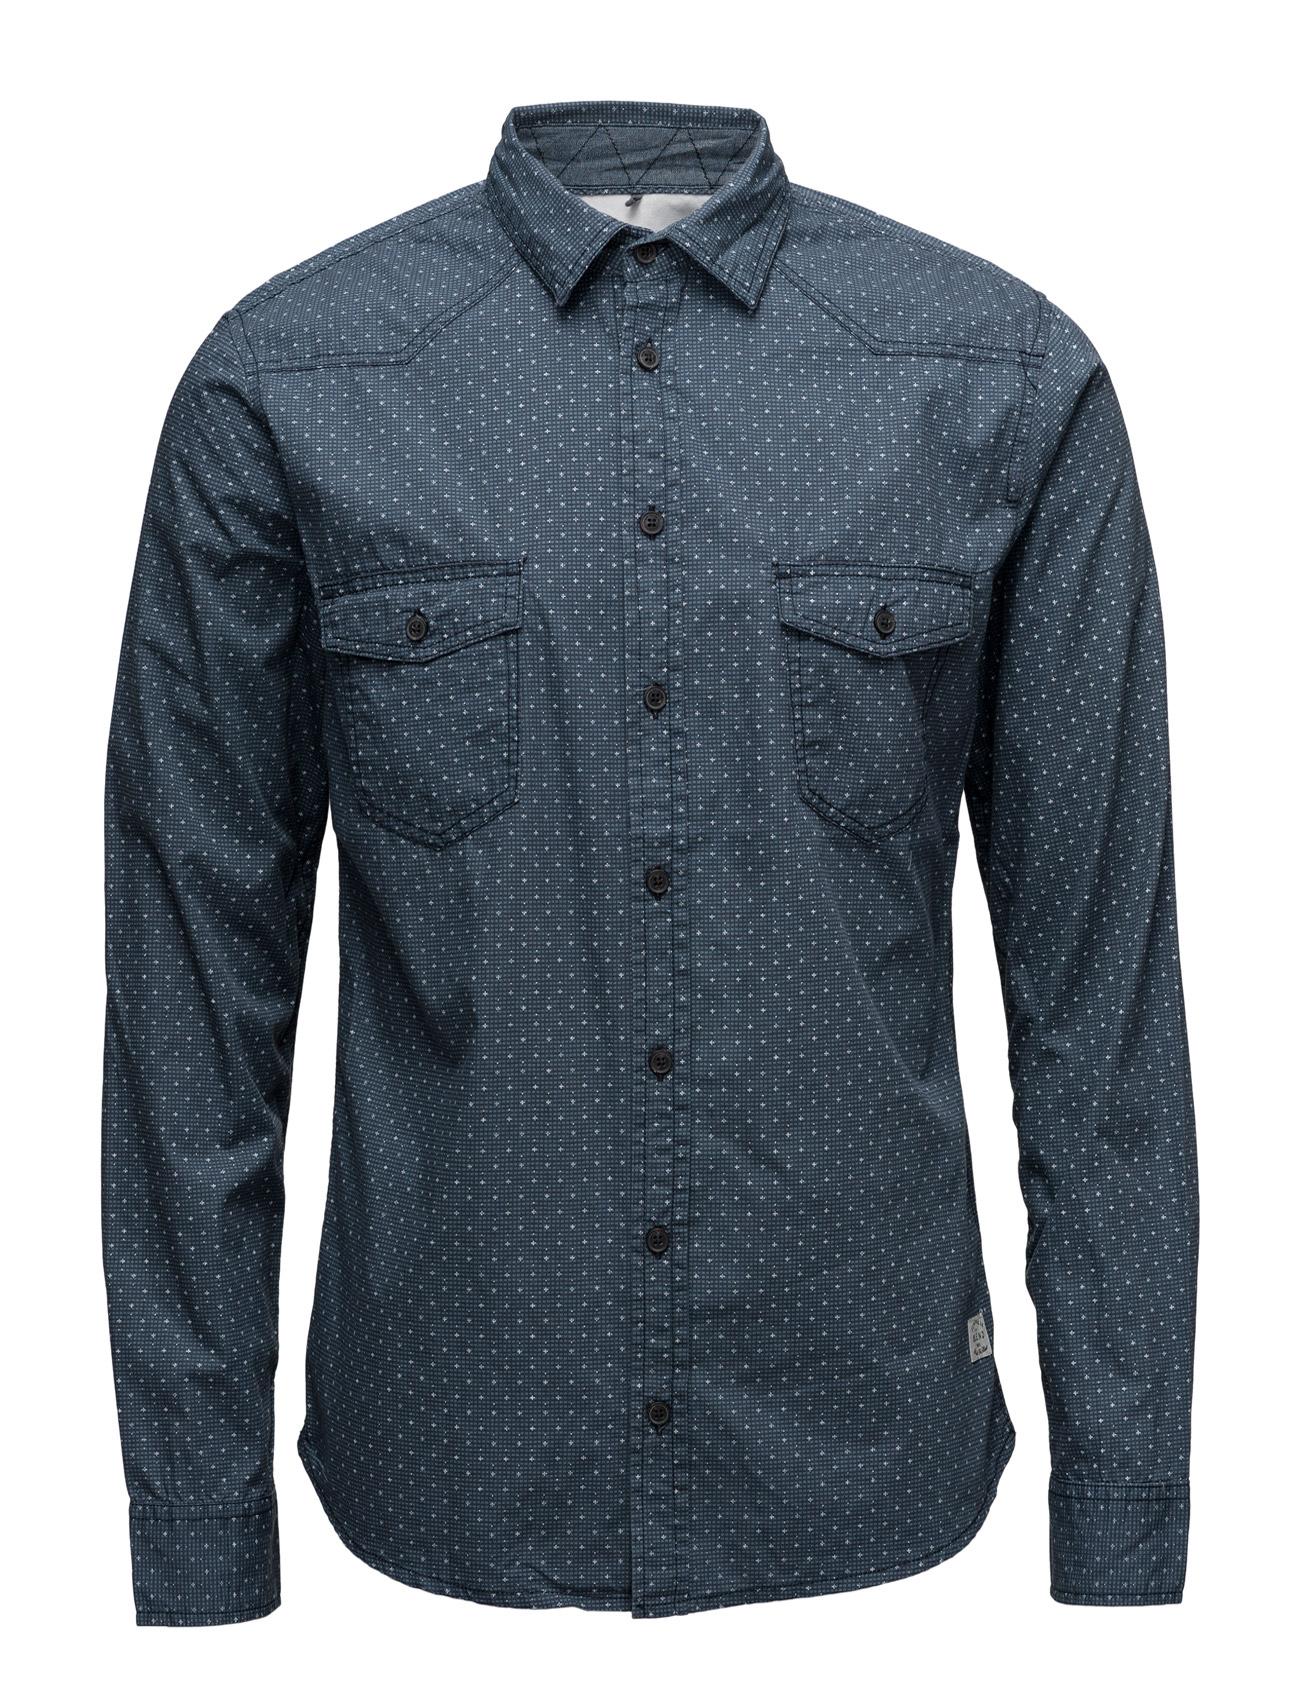 Shirt Blend Casual sko til Herrer i Mørkeblå